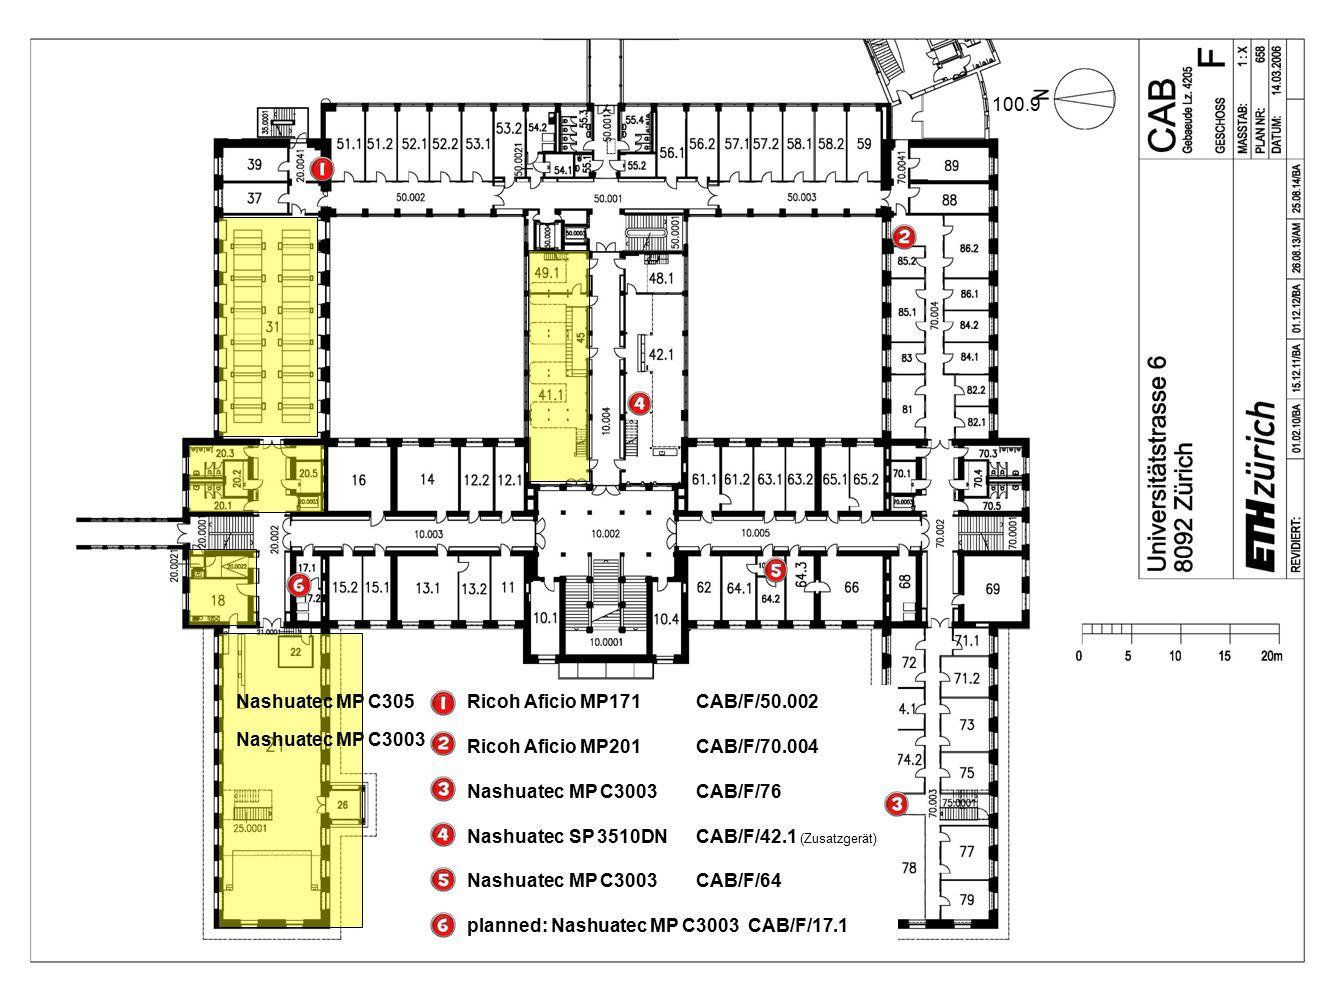 Ricoh Aficio MP2000 CAB/G/41 Nashuatec MP C3003 CAB/G/66.1 Ricoh MP161SPF CAB/G/69.3 planned